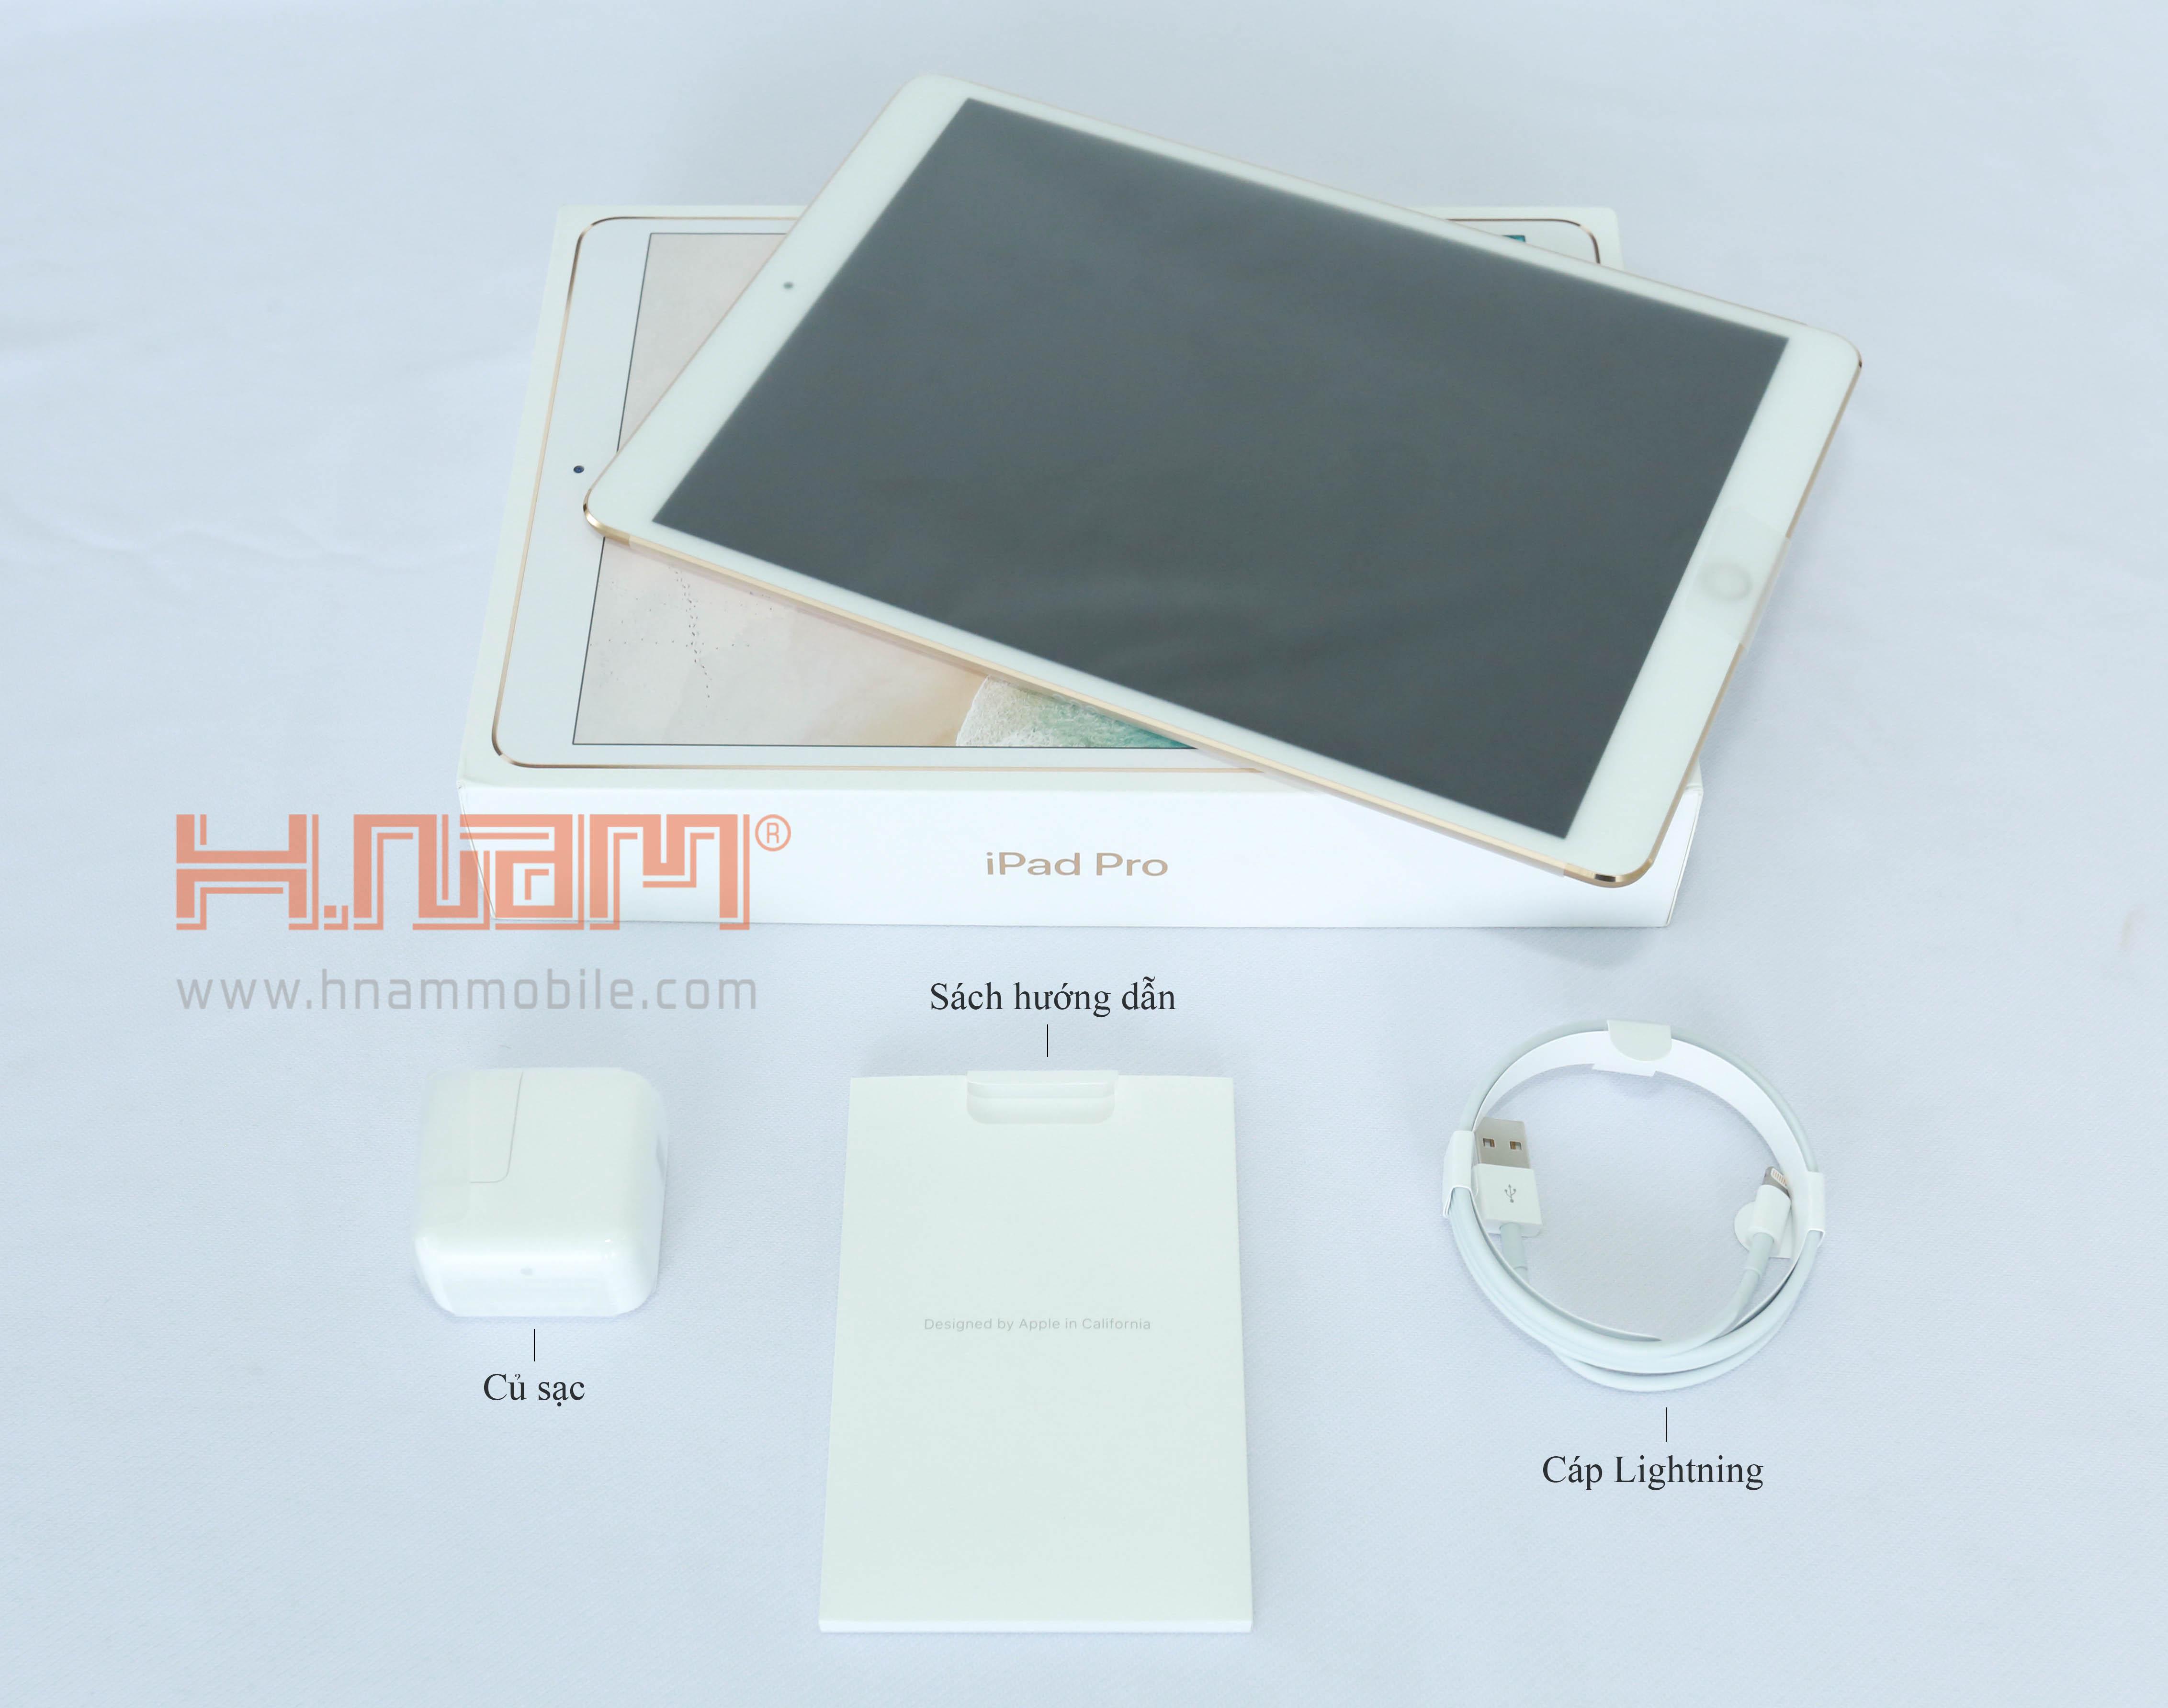 Apple iPad Pro 10.5 Cellular 64Gb hình sản phẩm 0